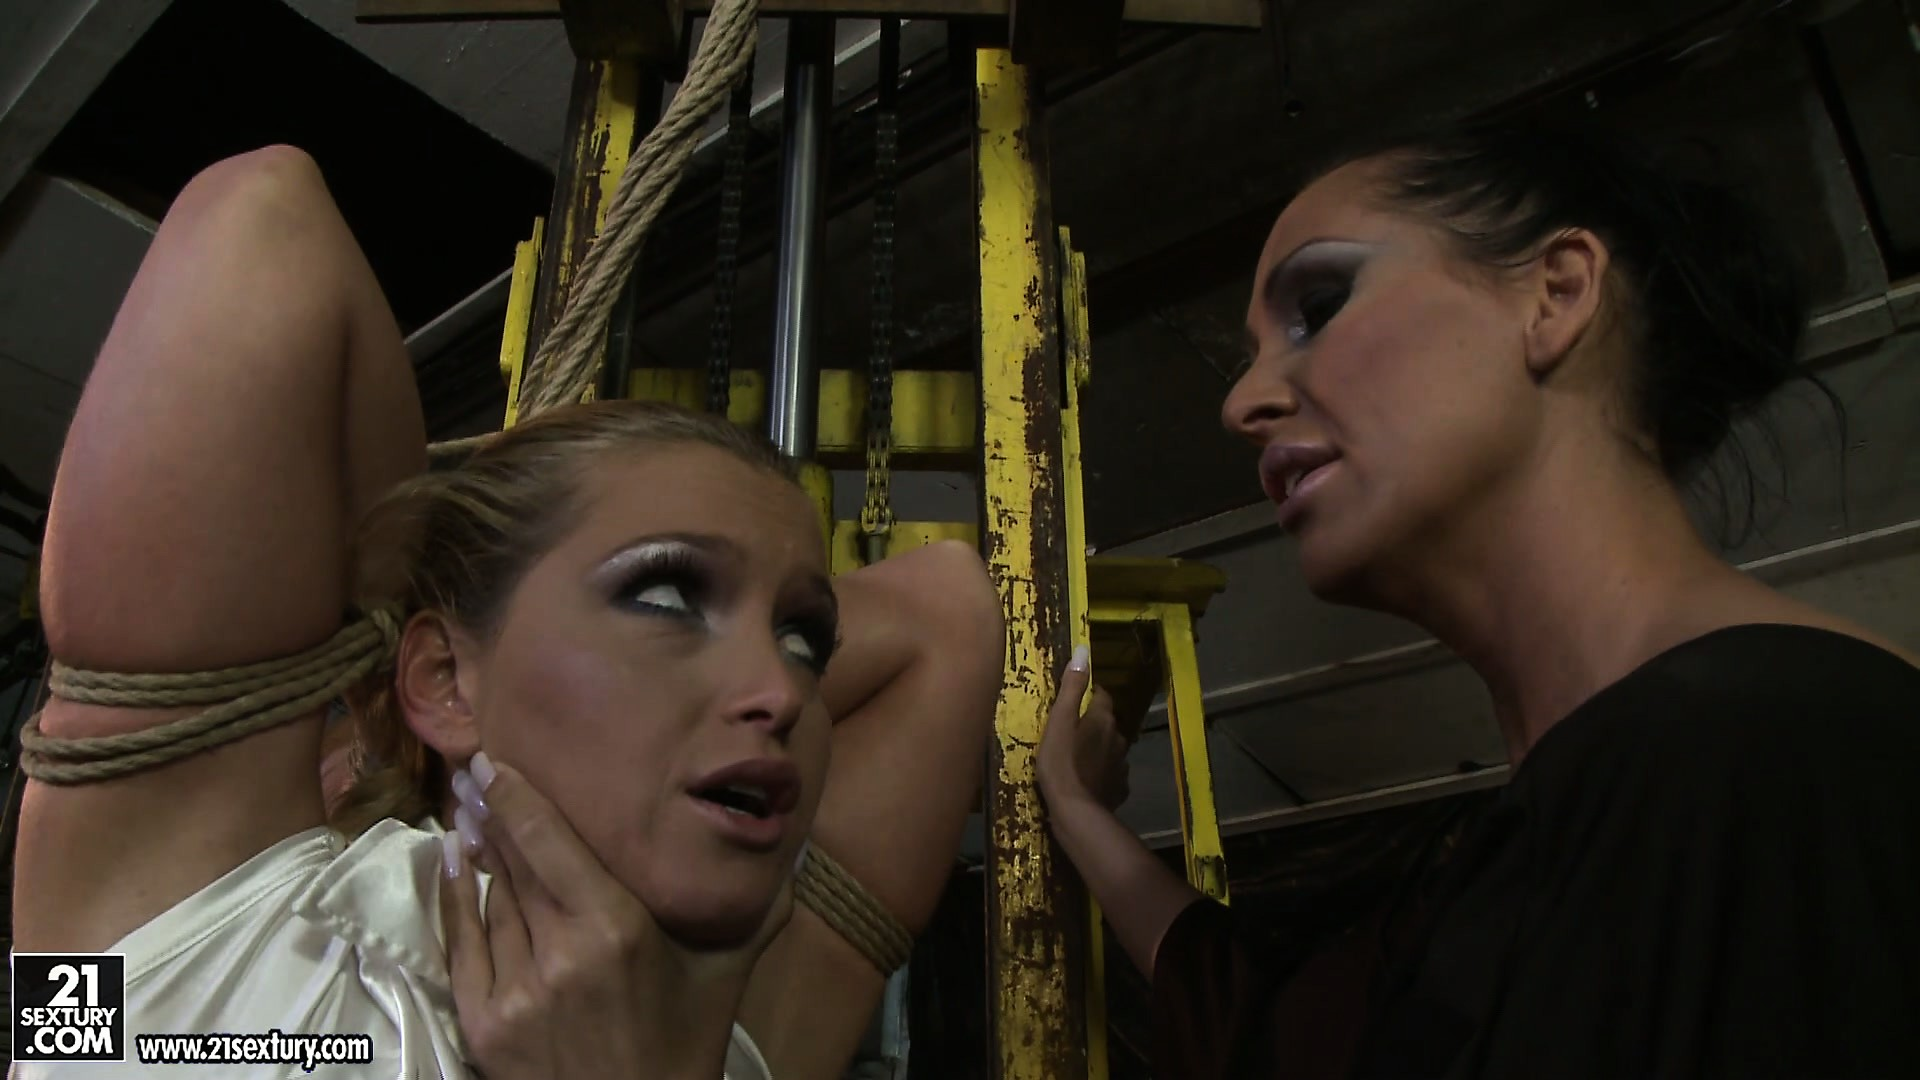 prostitutes sex videos john magnum gay porn videos